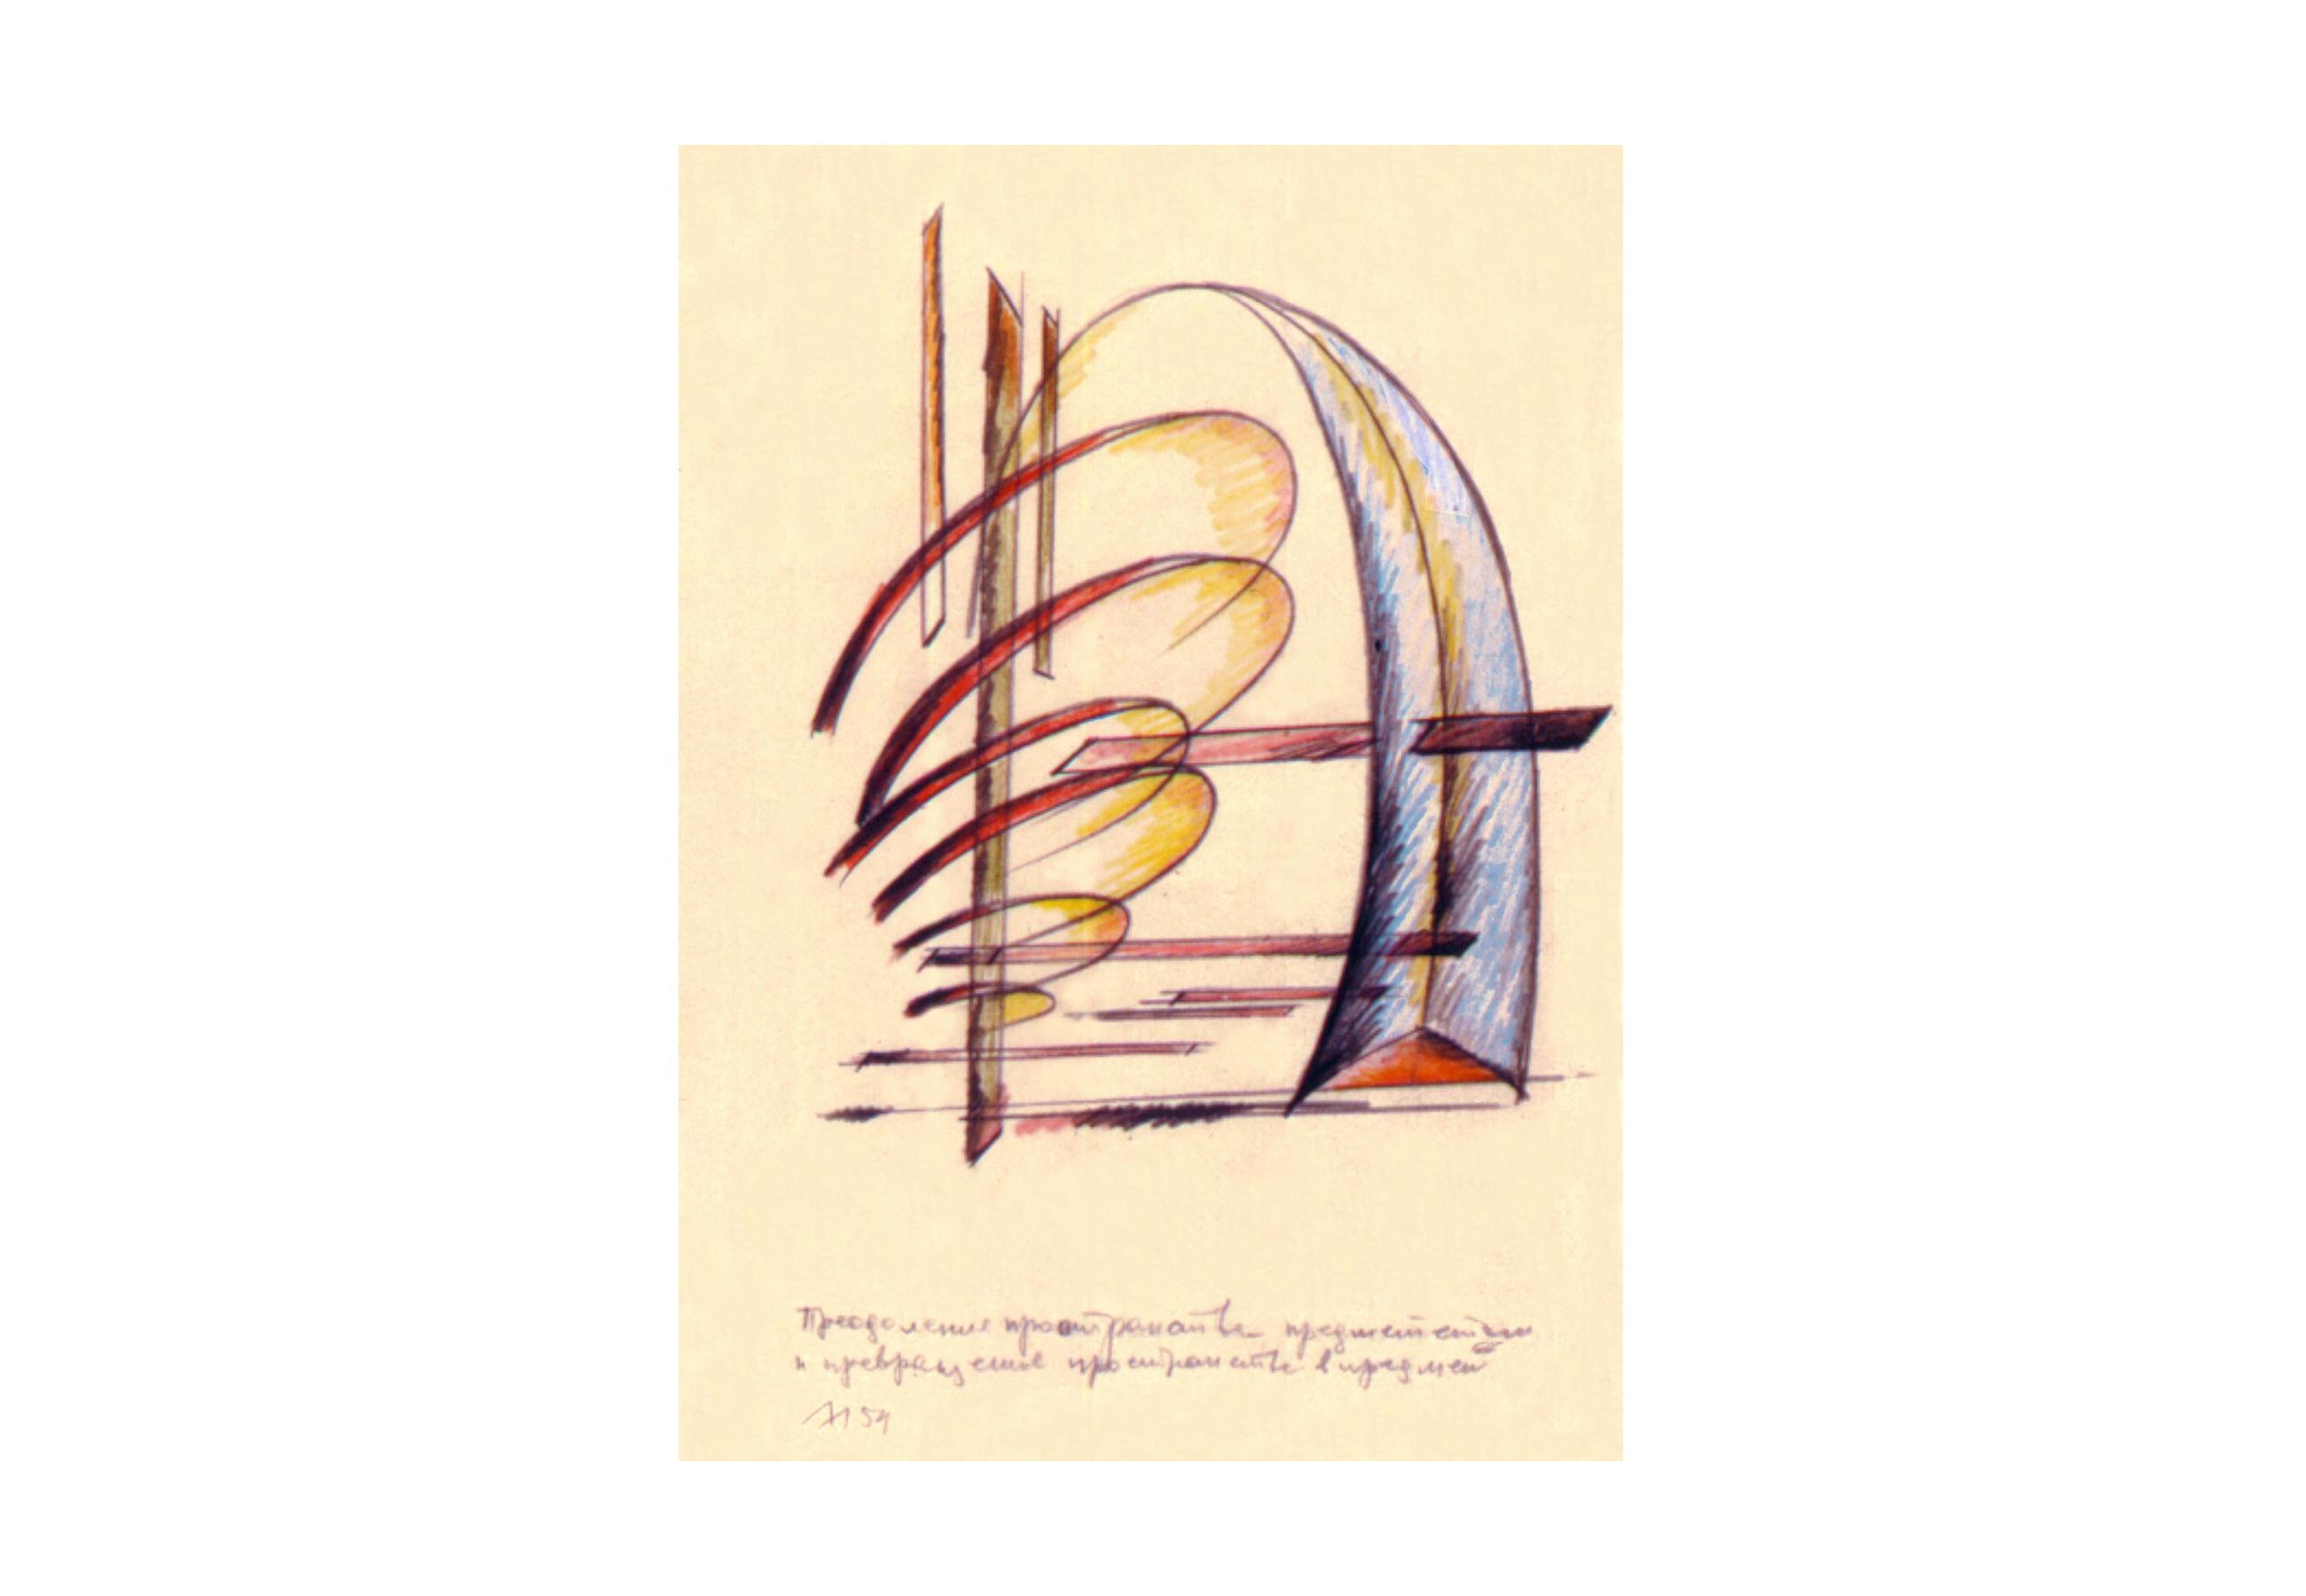 Lamm-Portfolio-1954-1955-02.jpg